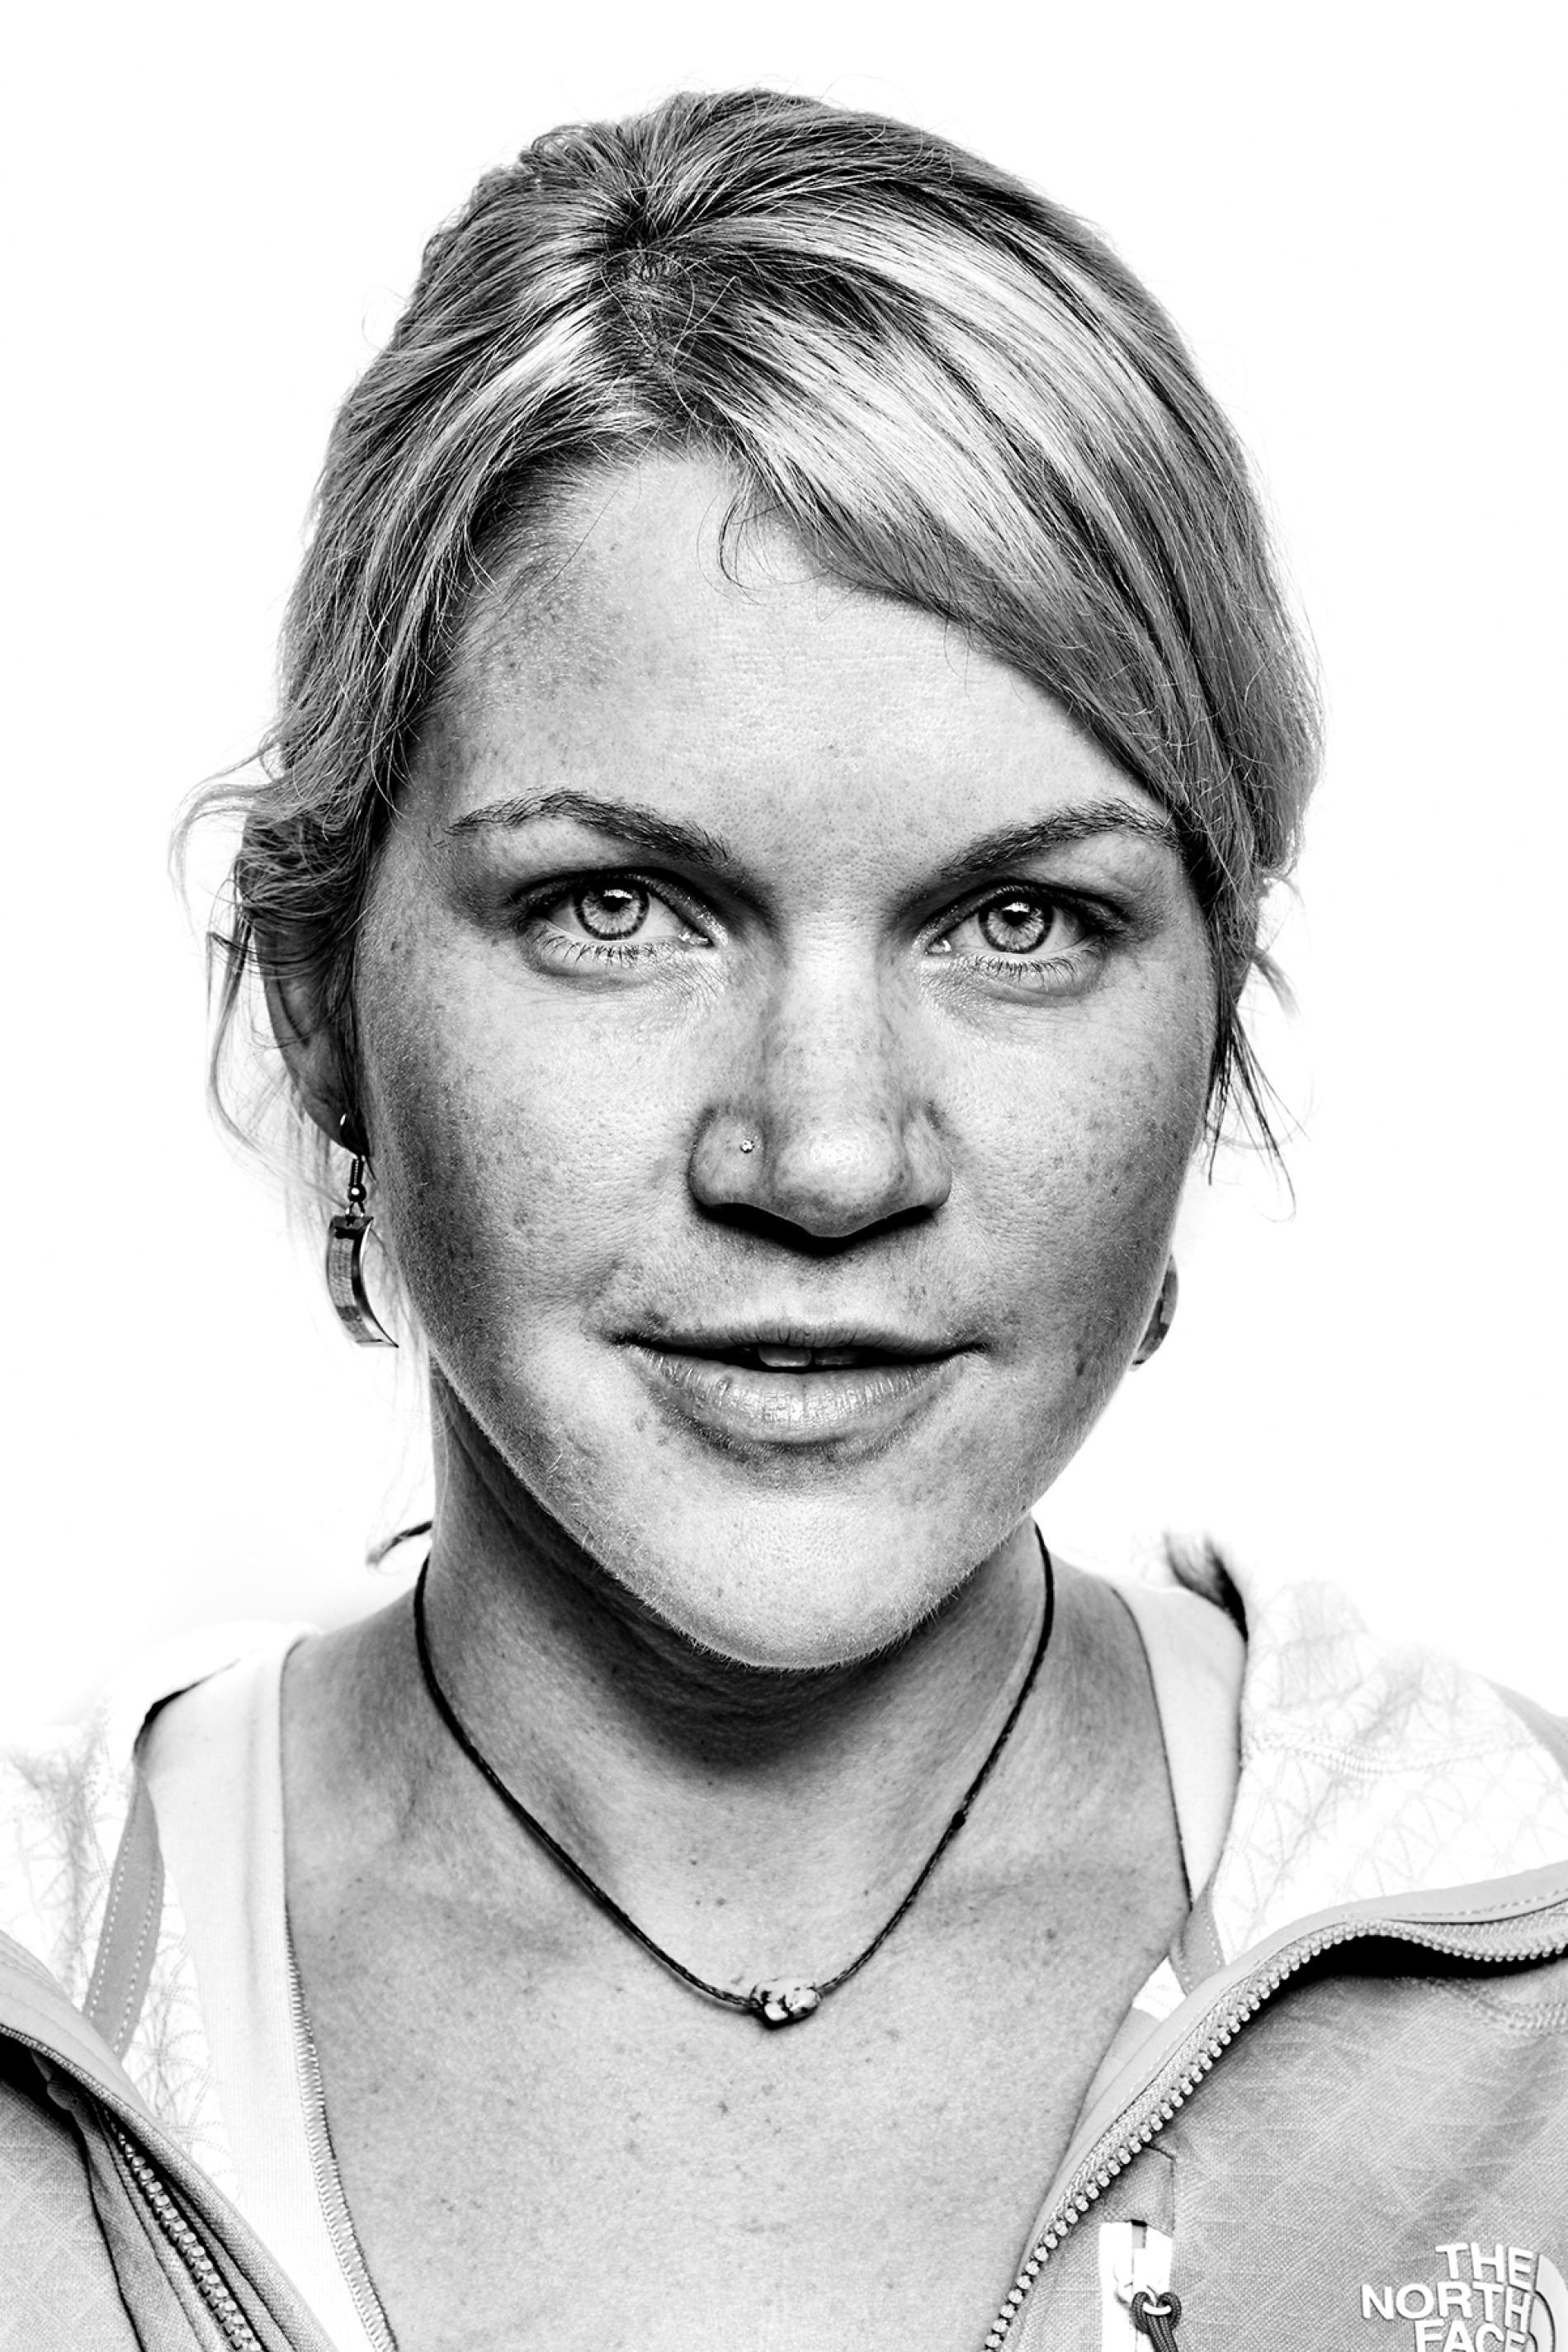 Anna-Pfaff-portrait.ngsversion.1513010427365.adapt.1900.1.jpg